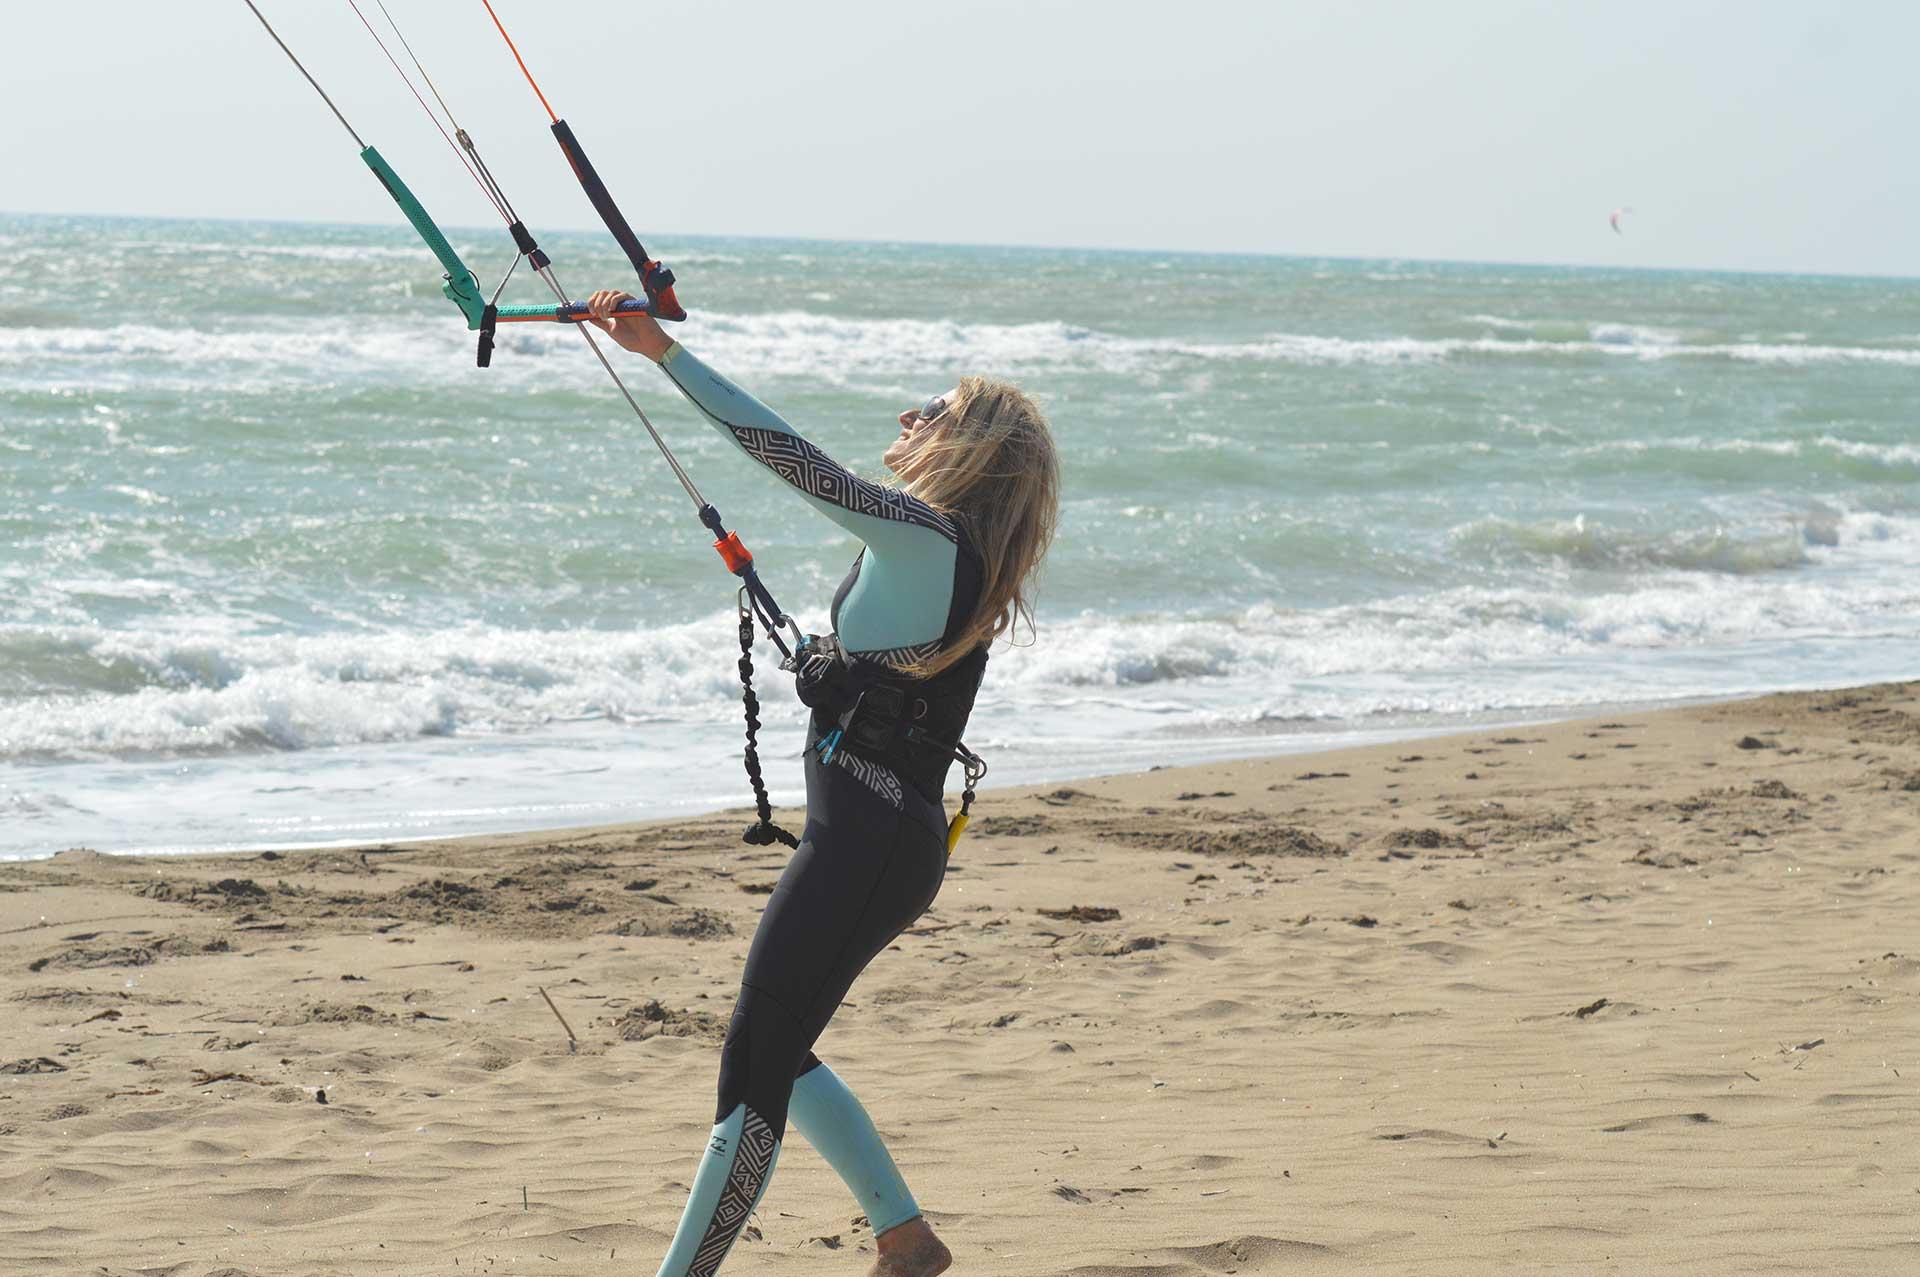 kitesurfing-ostia-scuola-kiteboarding-roma-16